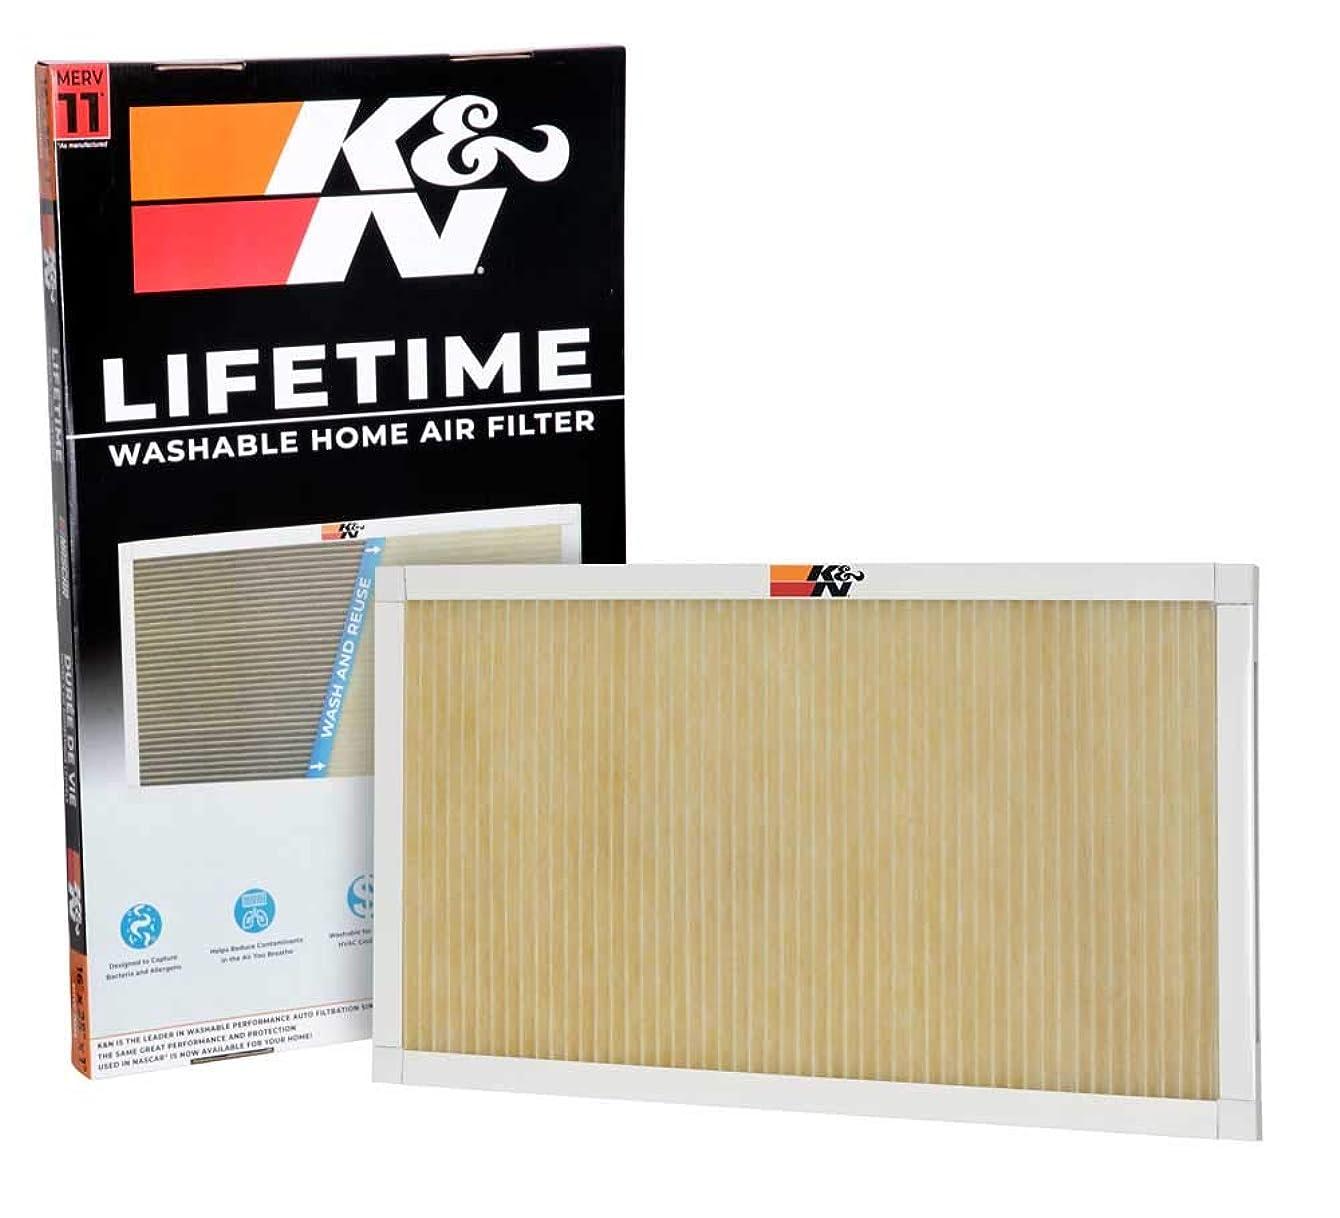 K&N HVC-11625 Lifetime Washable AC Furnace Air Filter, MERV 11 16x25x1